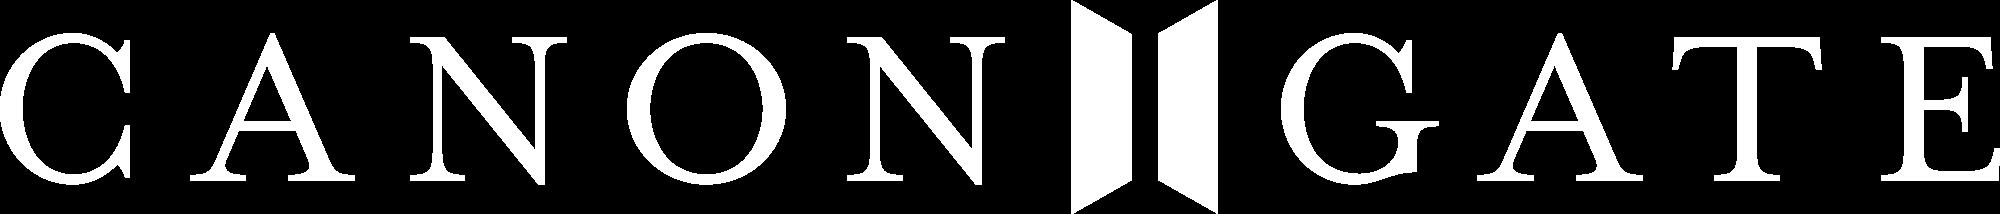 Canongate Books logo